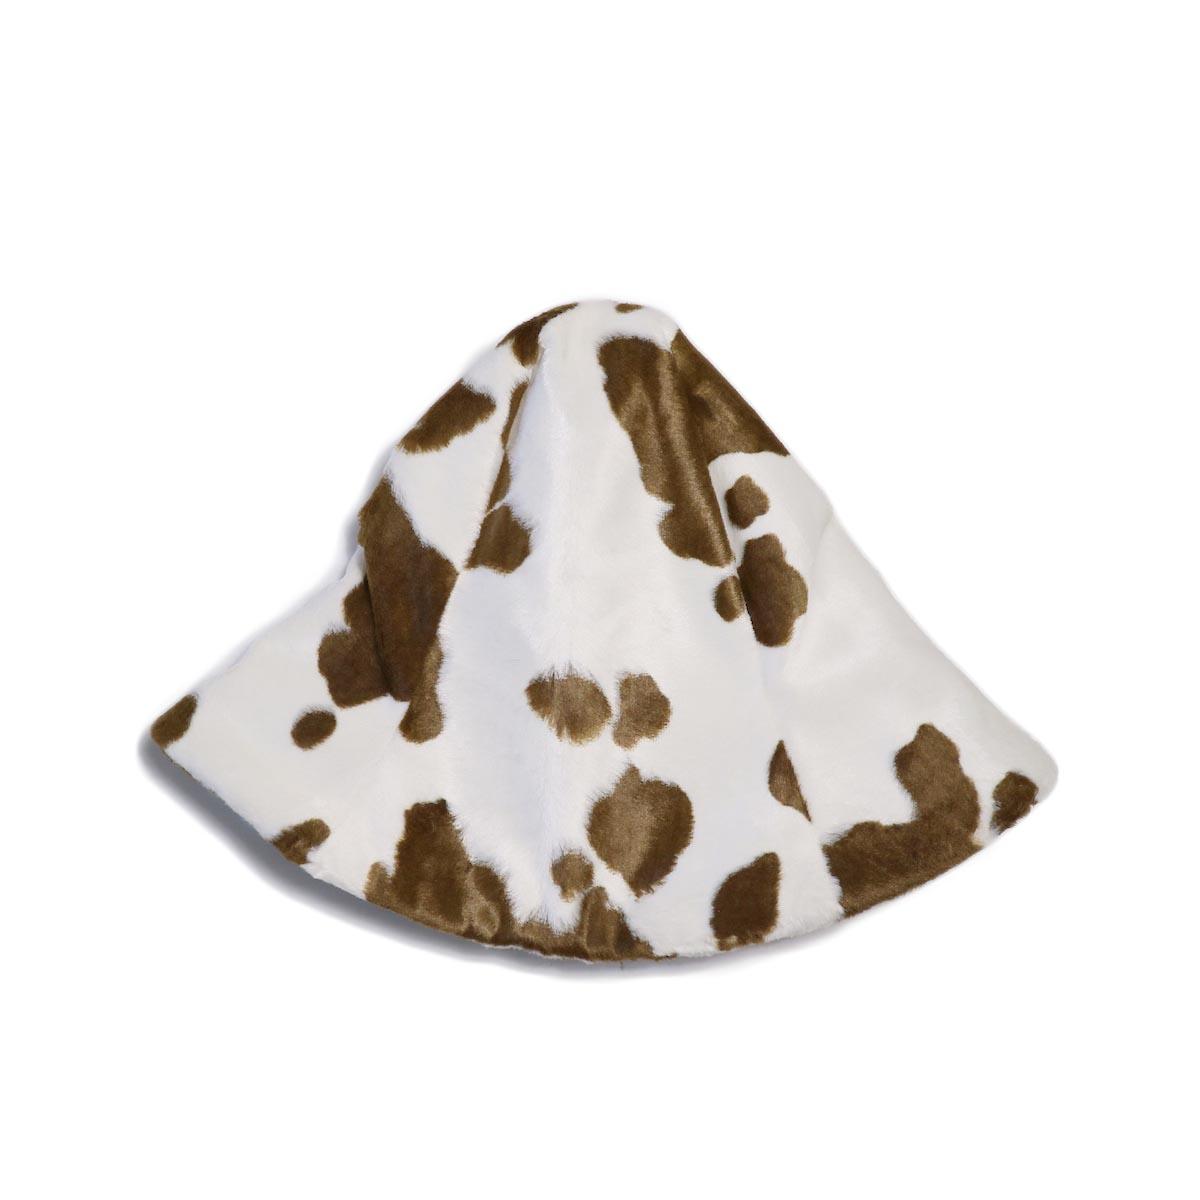 FUMIKA UCHIDA / COW SPOT PRINT TULIP HAT -WHITEBROWN